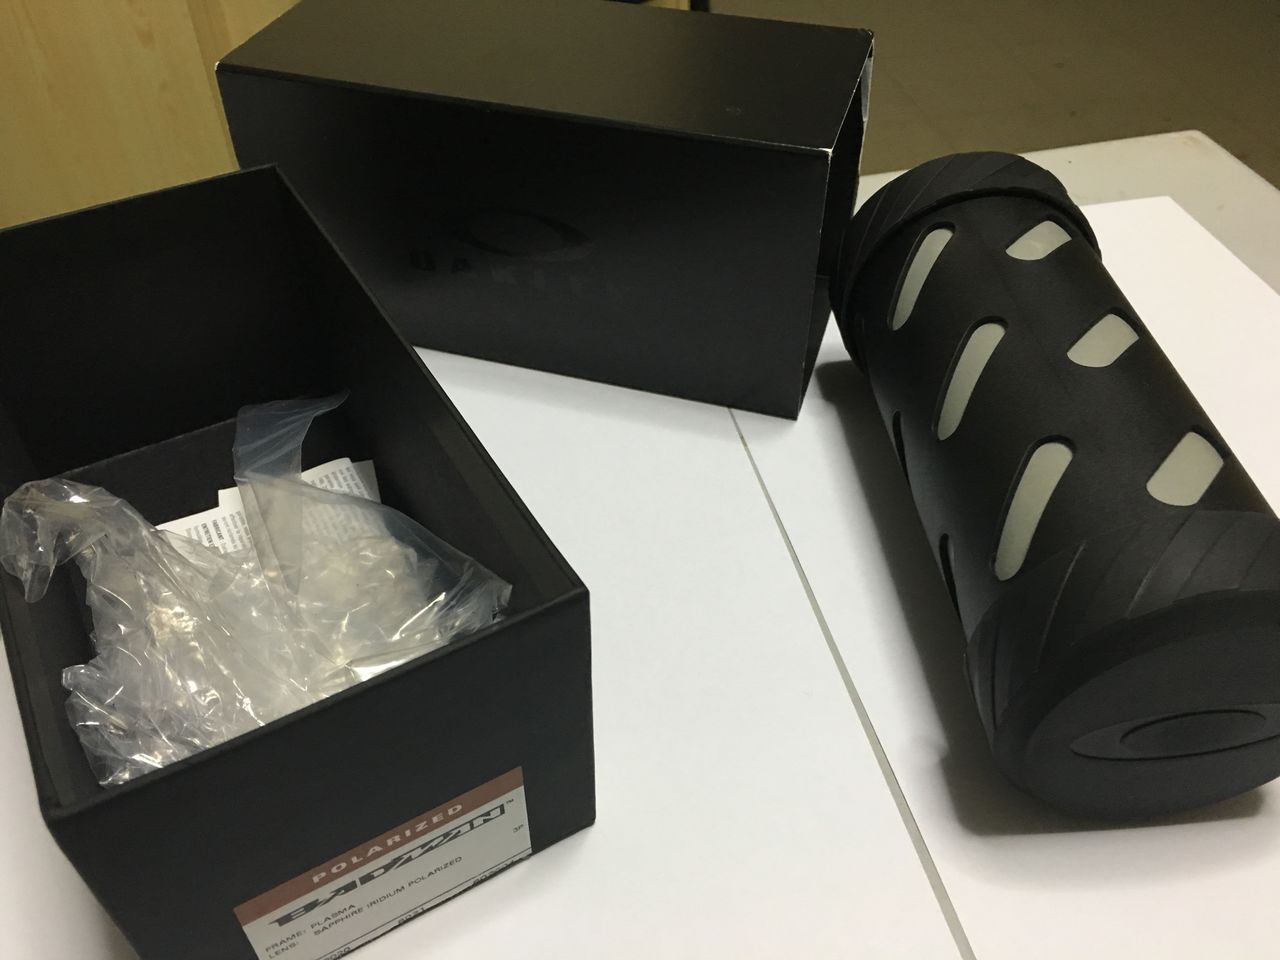 FS: Xsquared, Carbon frame OOBIP sku oo6011-08, Badman Plasma frame with Sapphire lenses - IMG_1390.jpg